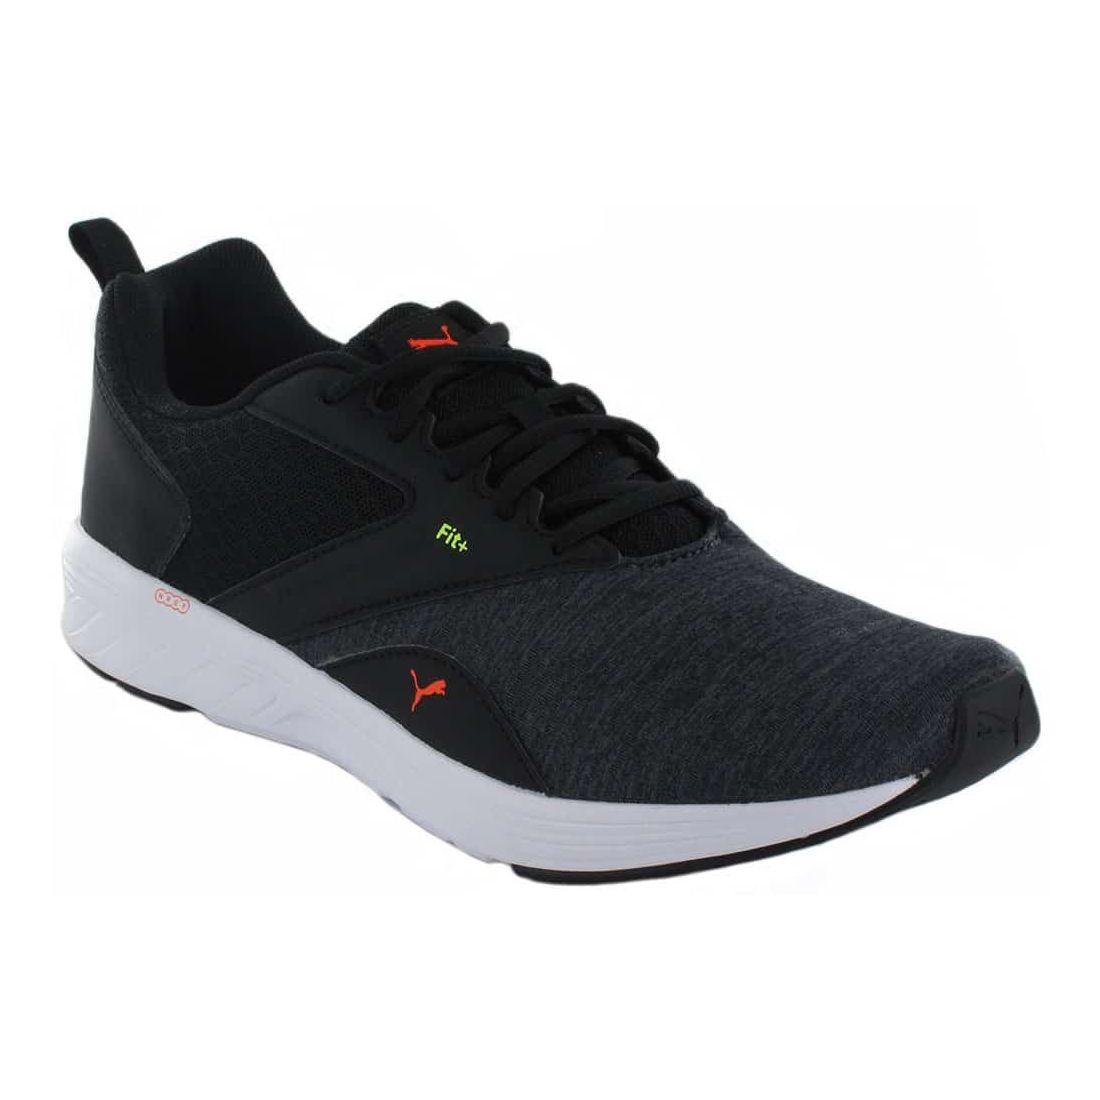 Puma NRGY Comet Black - Mens Running Shoes